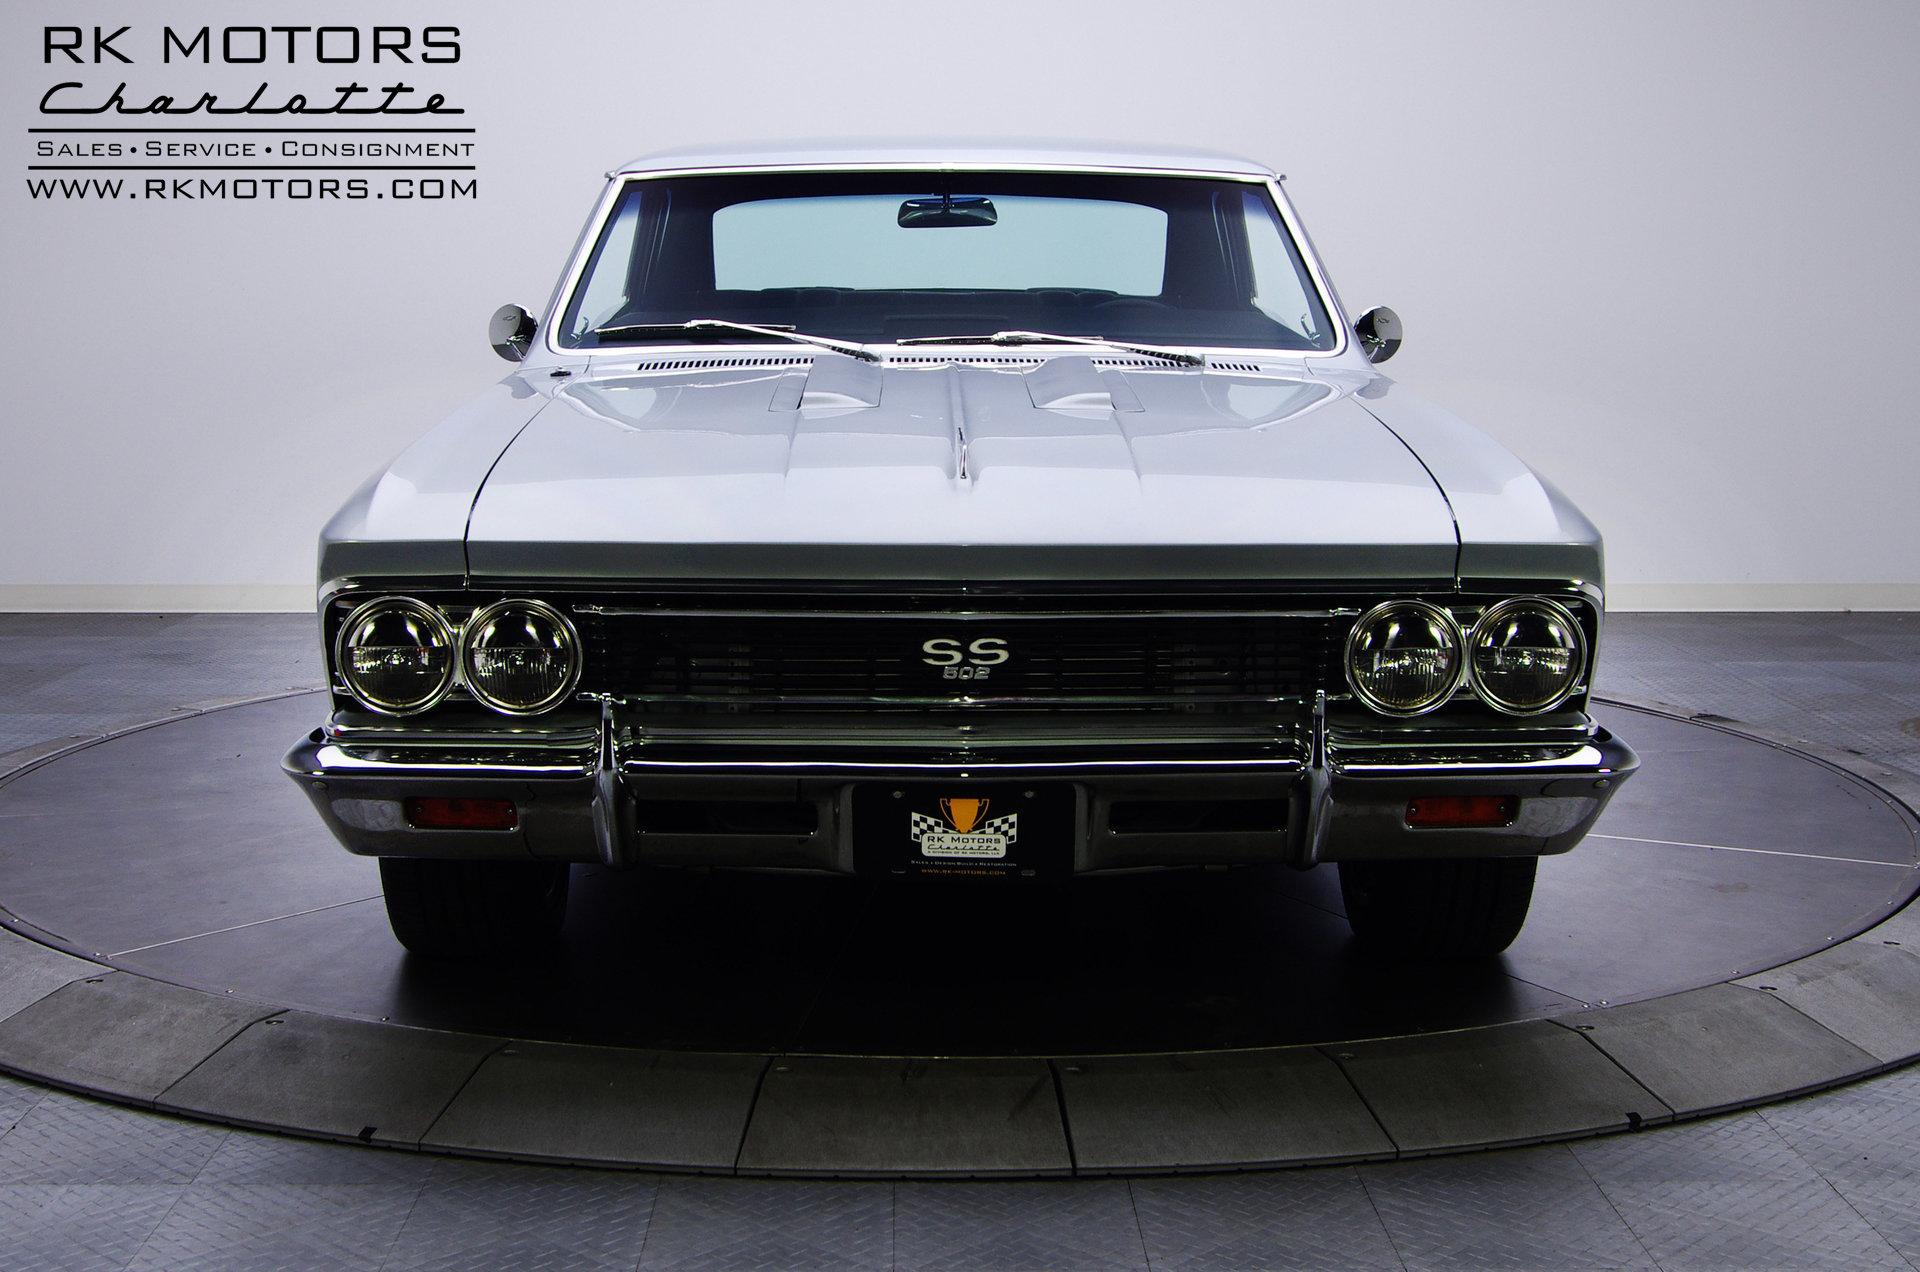 132629 1966 Chevrolet Chevelle Rk Motors Classic Cars For Sale Super Sport